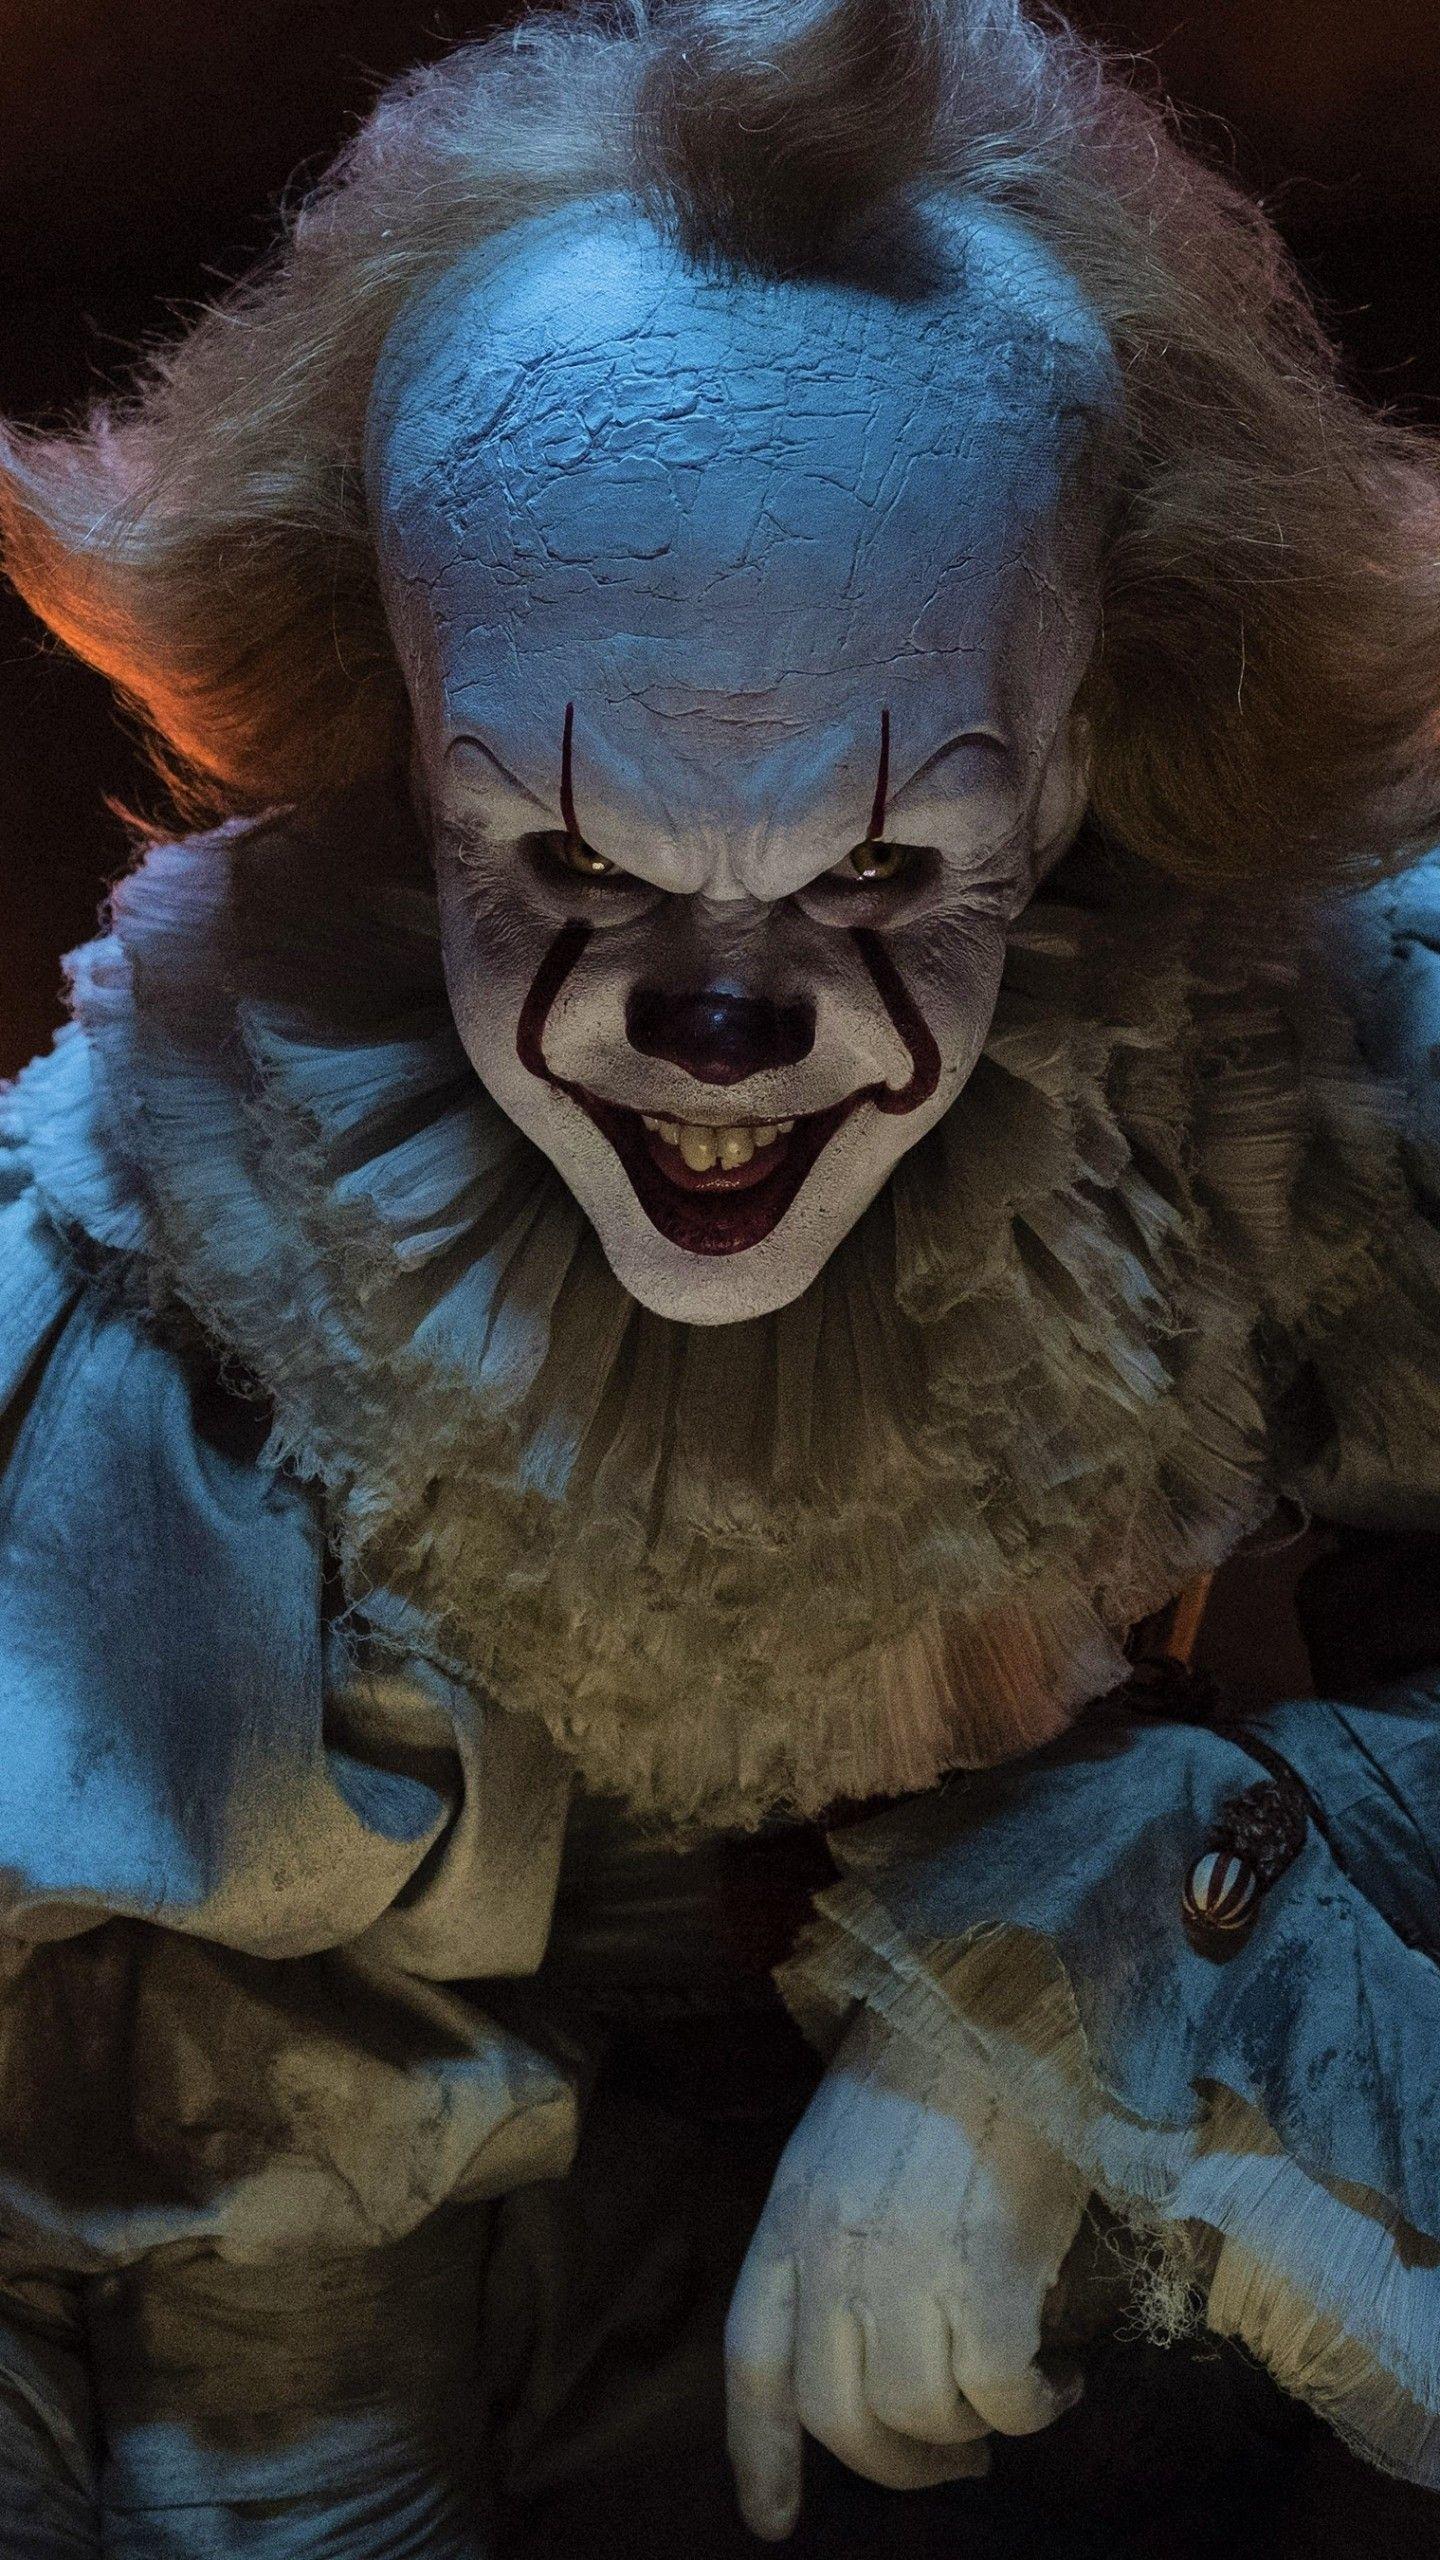 1440x2560 Wallpaper 694690 | Clown horror, Horror movie characters, Horror  movie icons